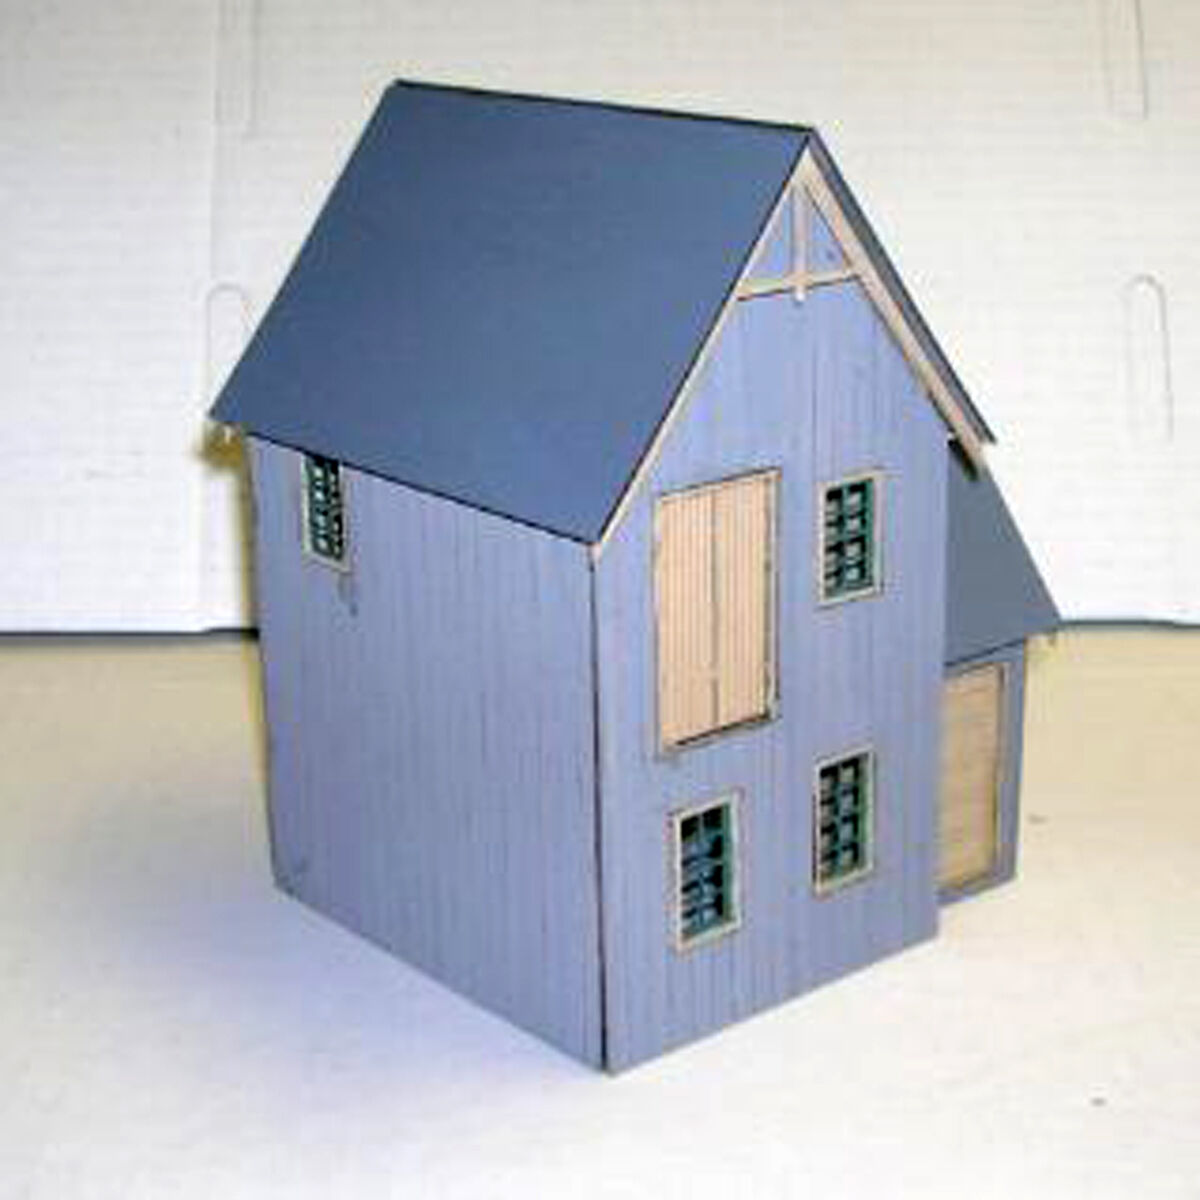 Cooper 's loft o 8. am30 modelleisenbahn struktur unlackiert holz - kit df418